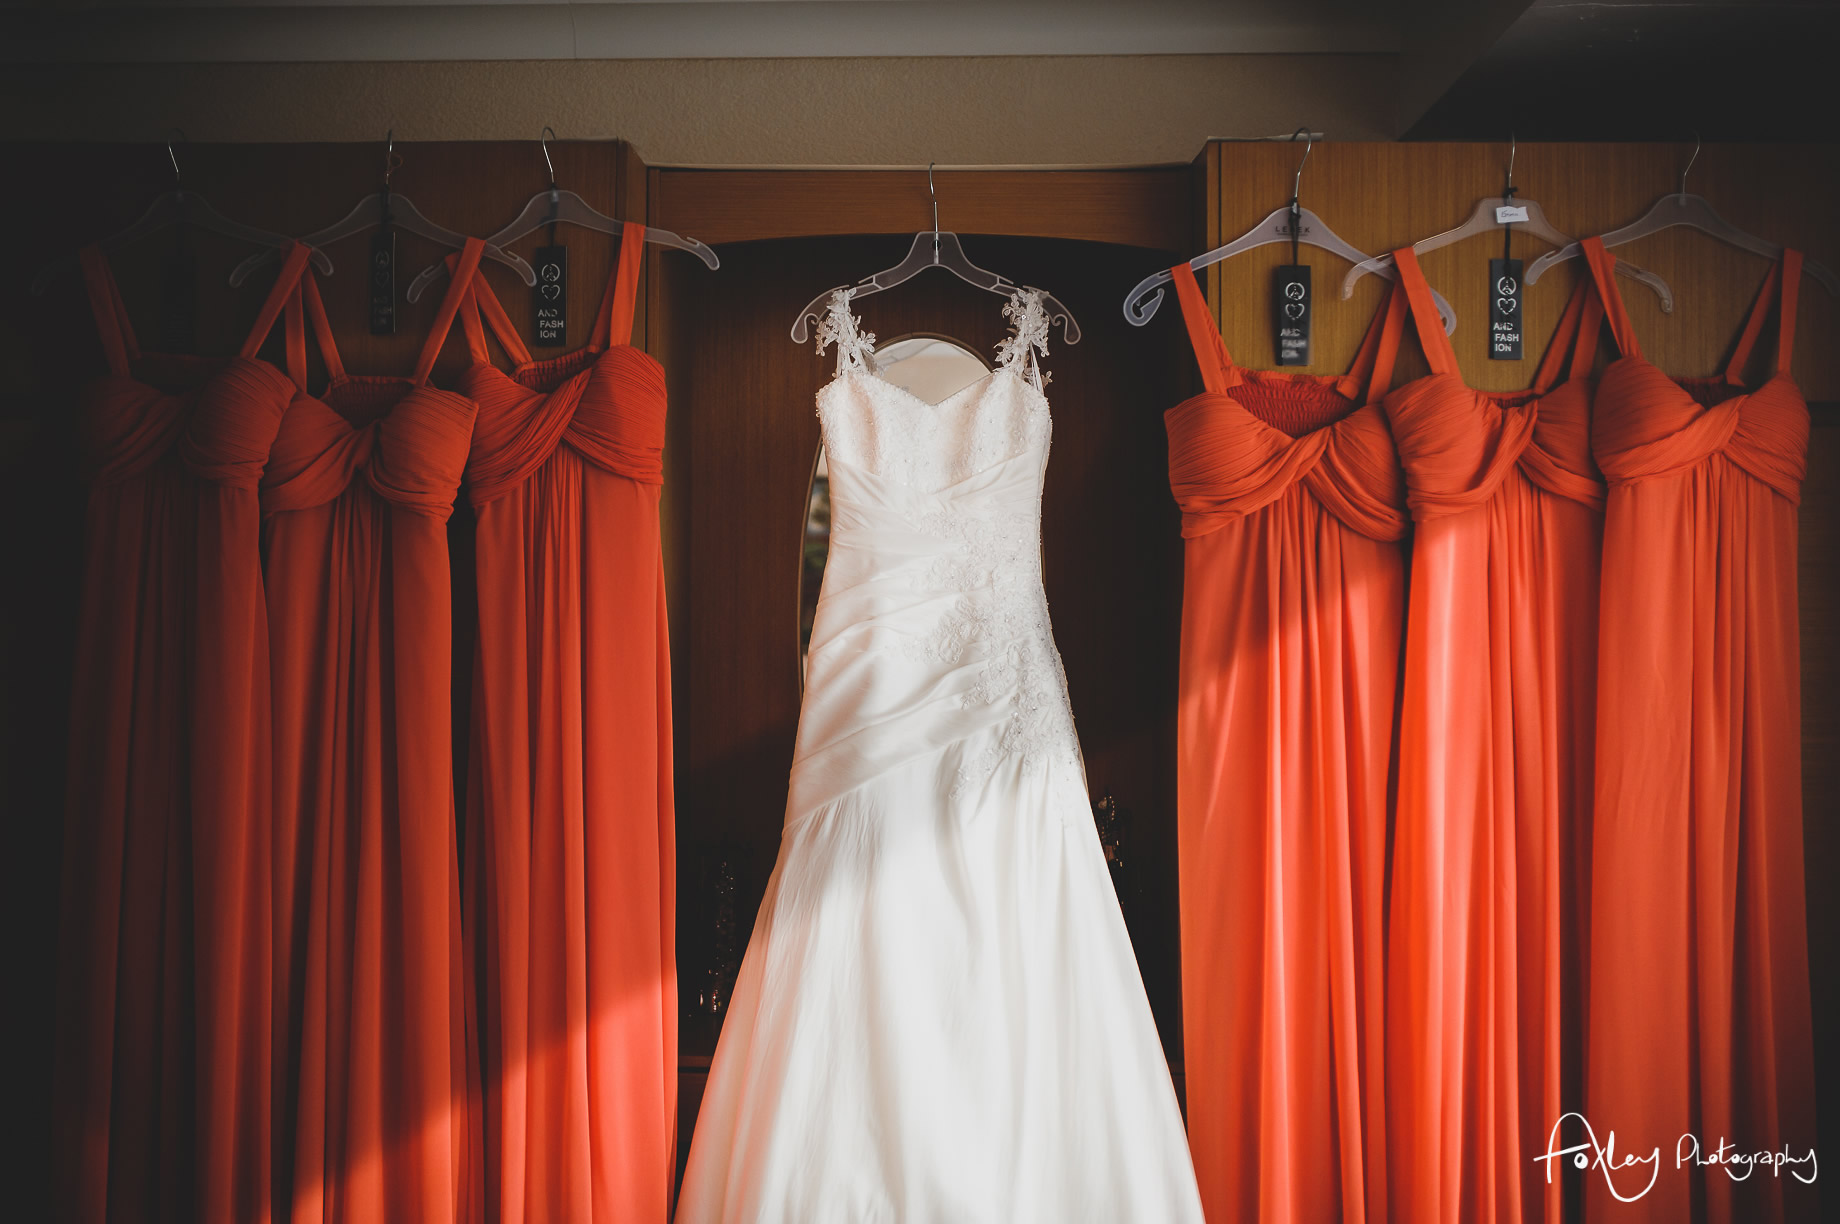 Gemma and Lewis' Wedding at Mitton Hall 002